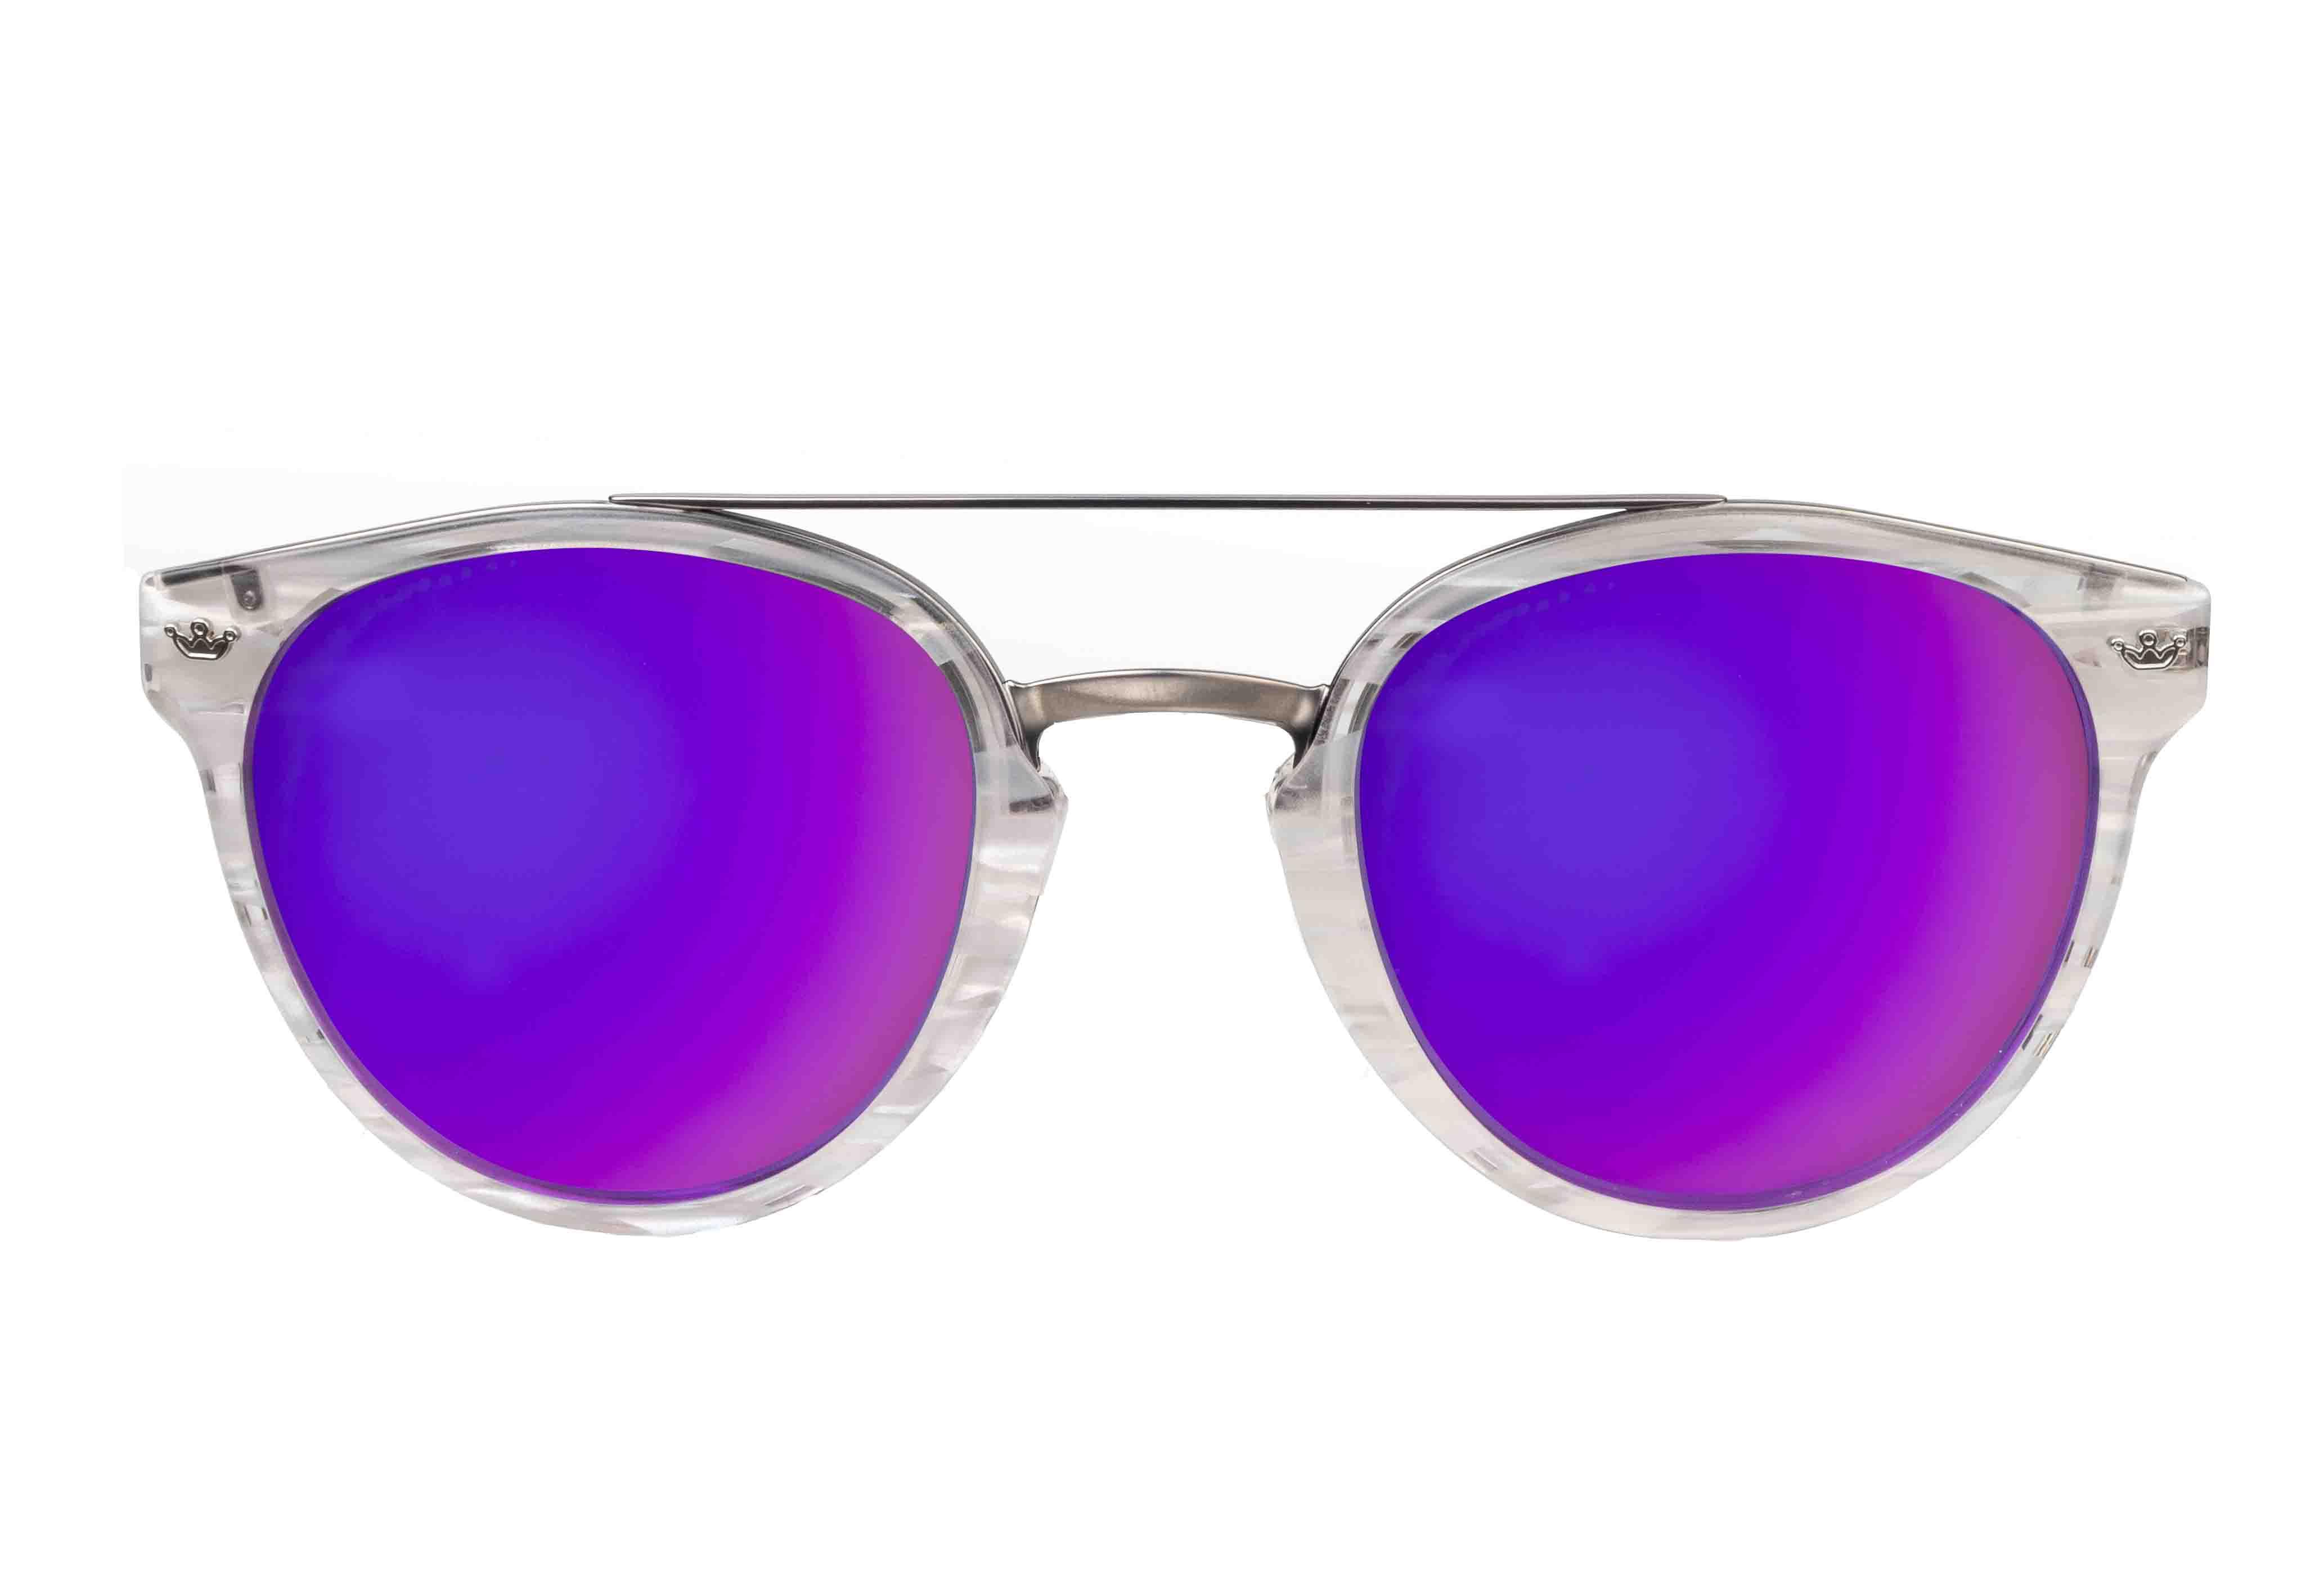 488273_osaka_3_sunglasses